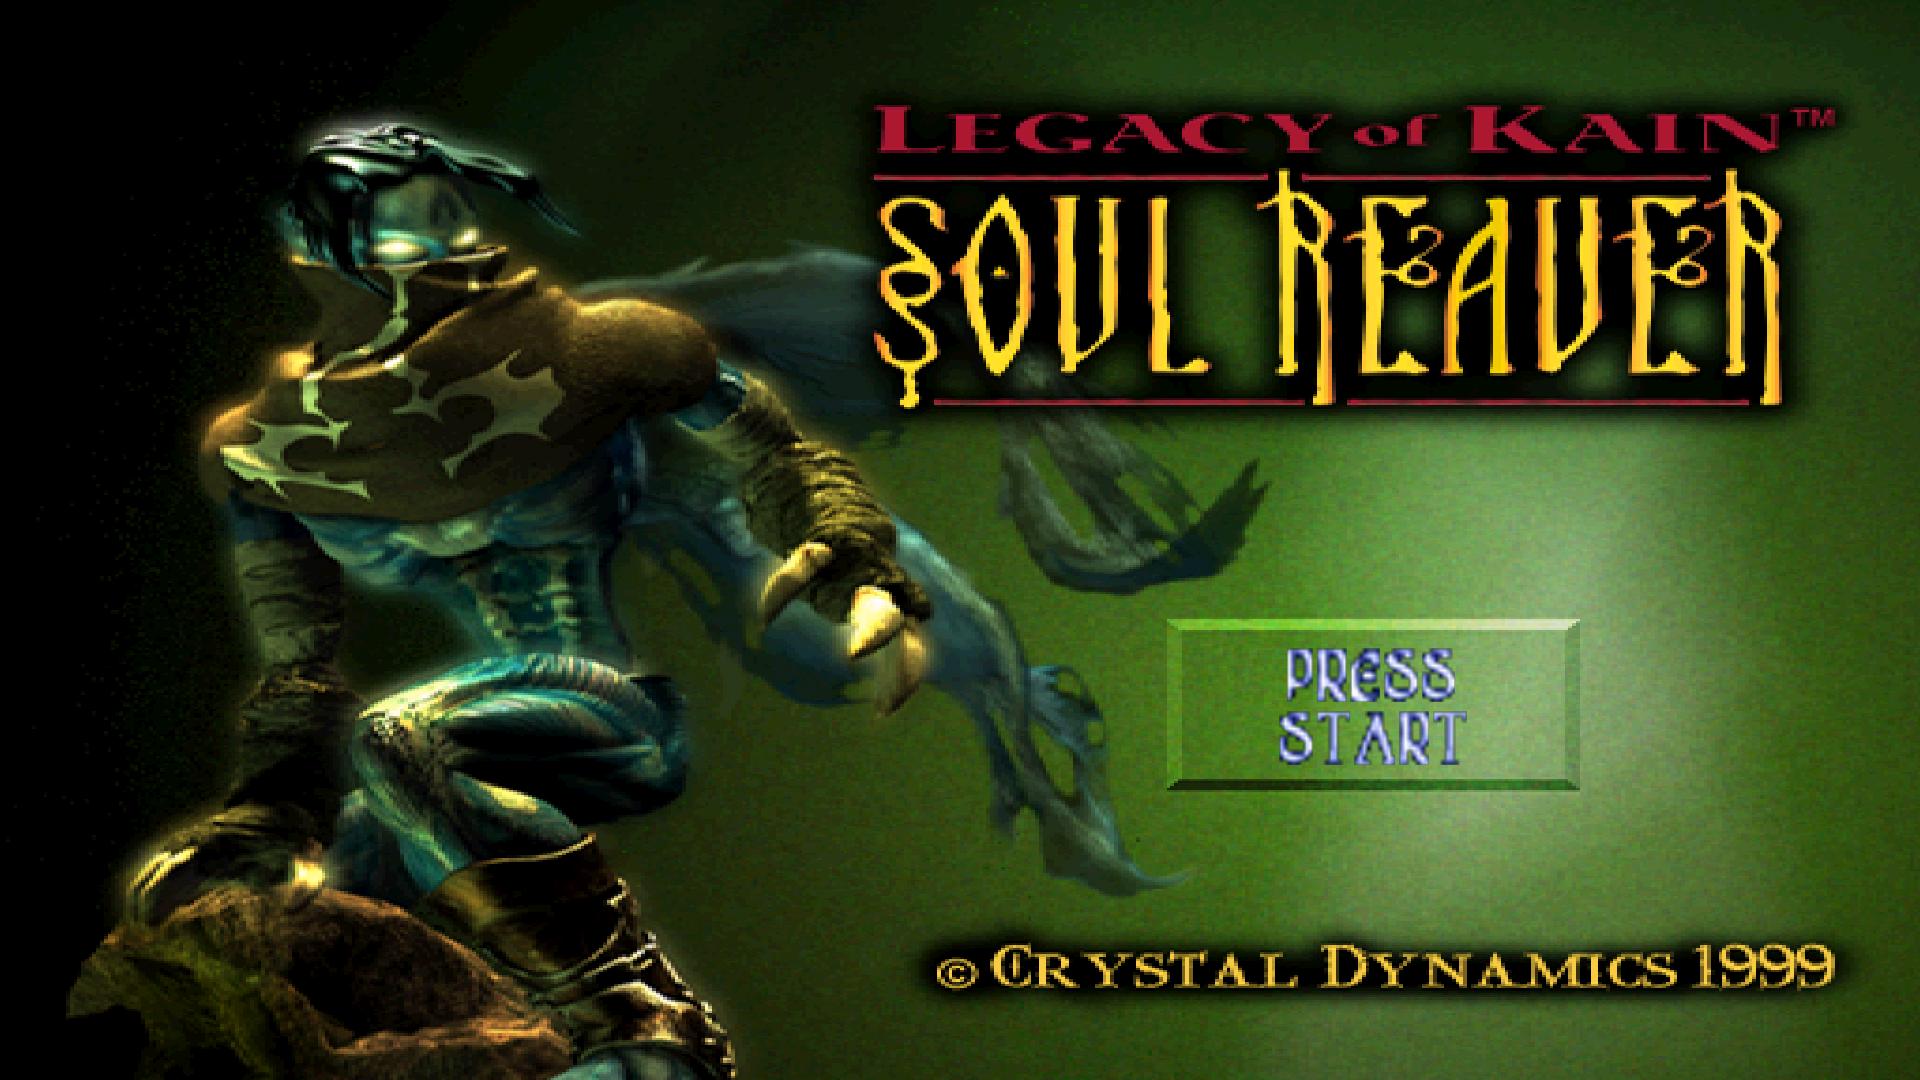 Legacy of Kain Soul Reaver [1] Wins Again